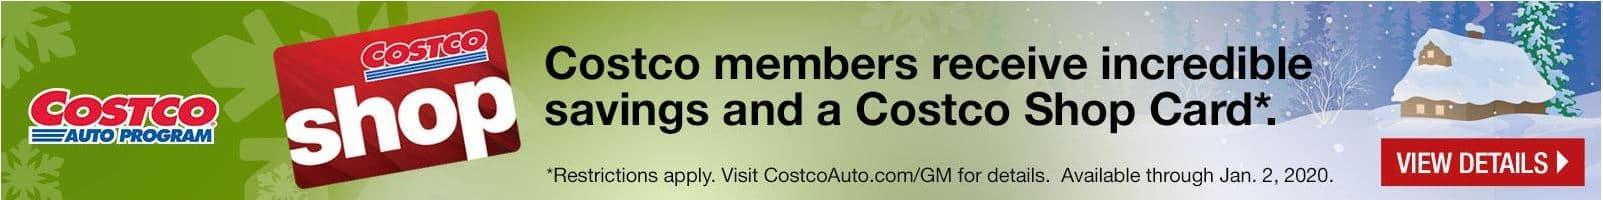 costco savings banner